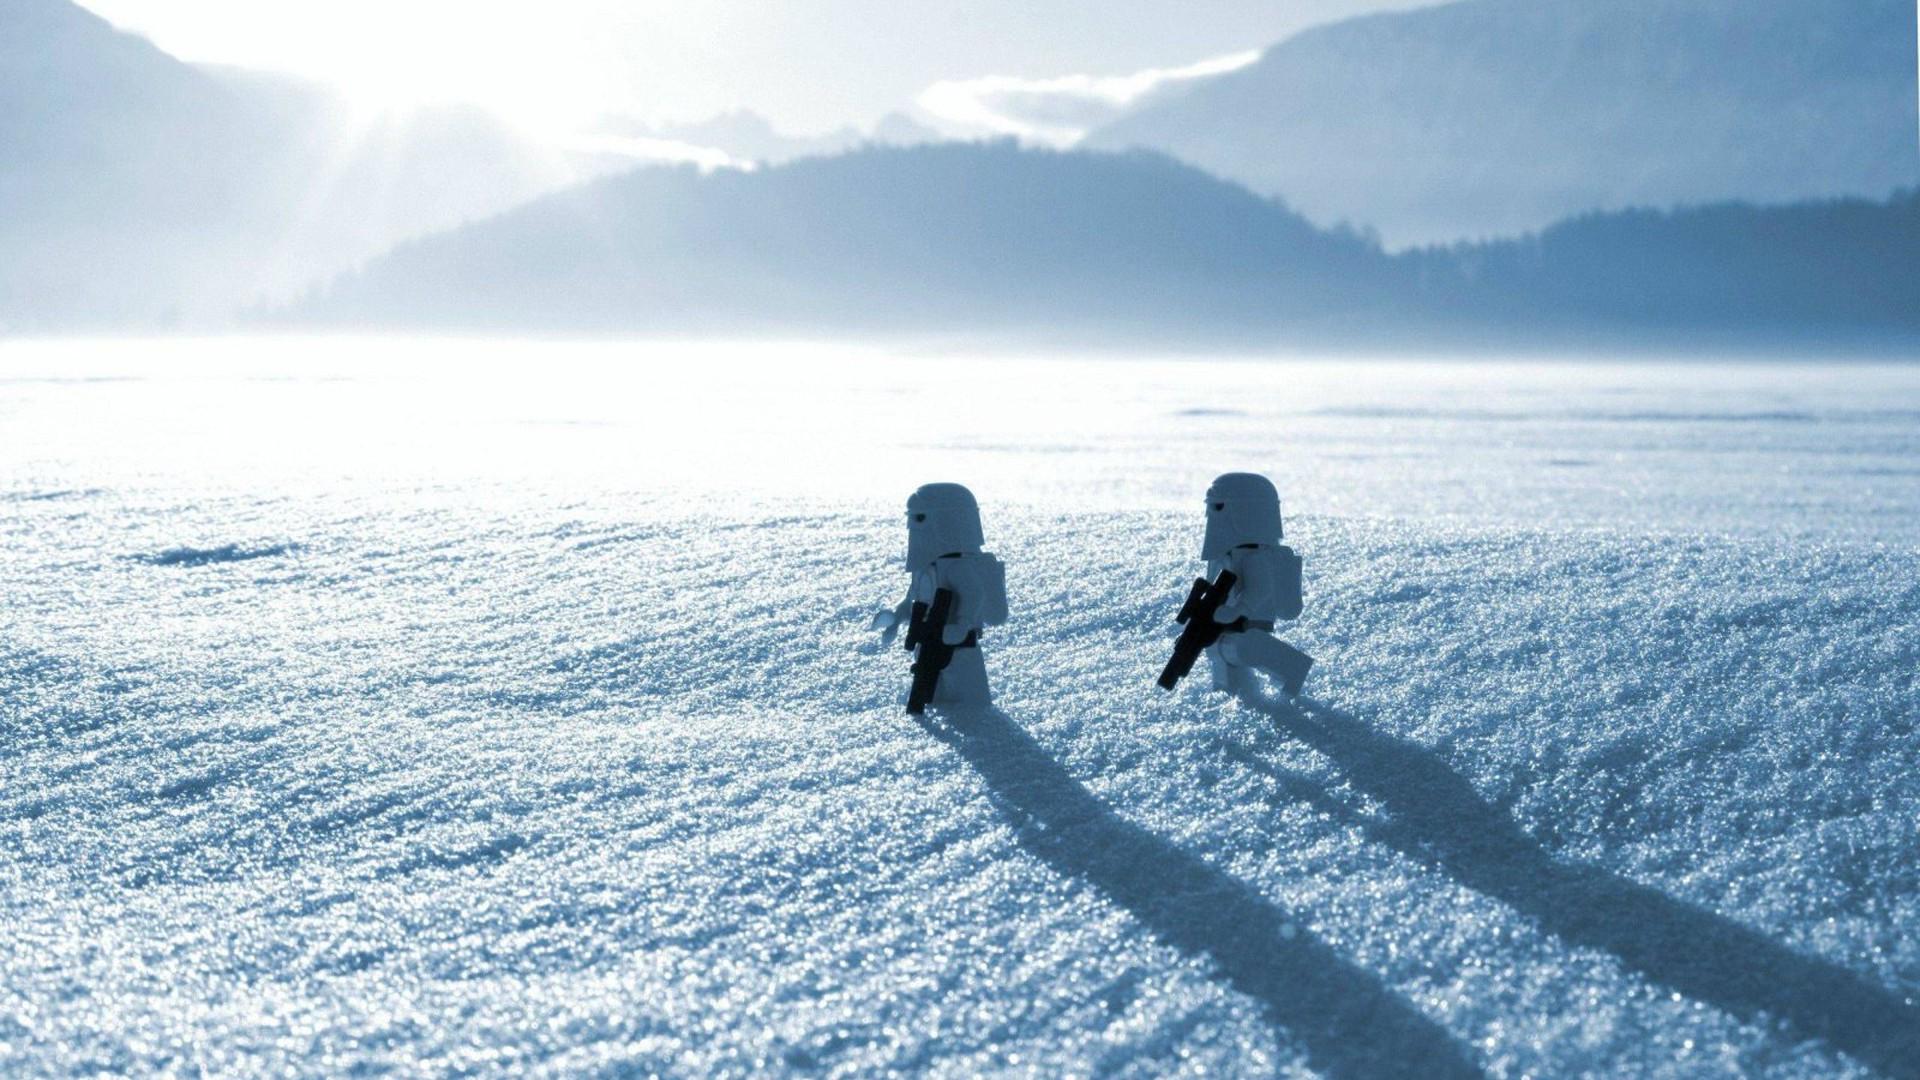 sunlight landscape Star Wars sea sky snow winter ice frost horizon Arctic Freezing tundra vacation mountain 1920x1080 px polar ice cap ice cap glacial landform 784509